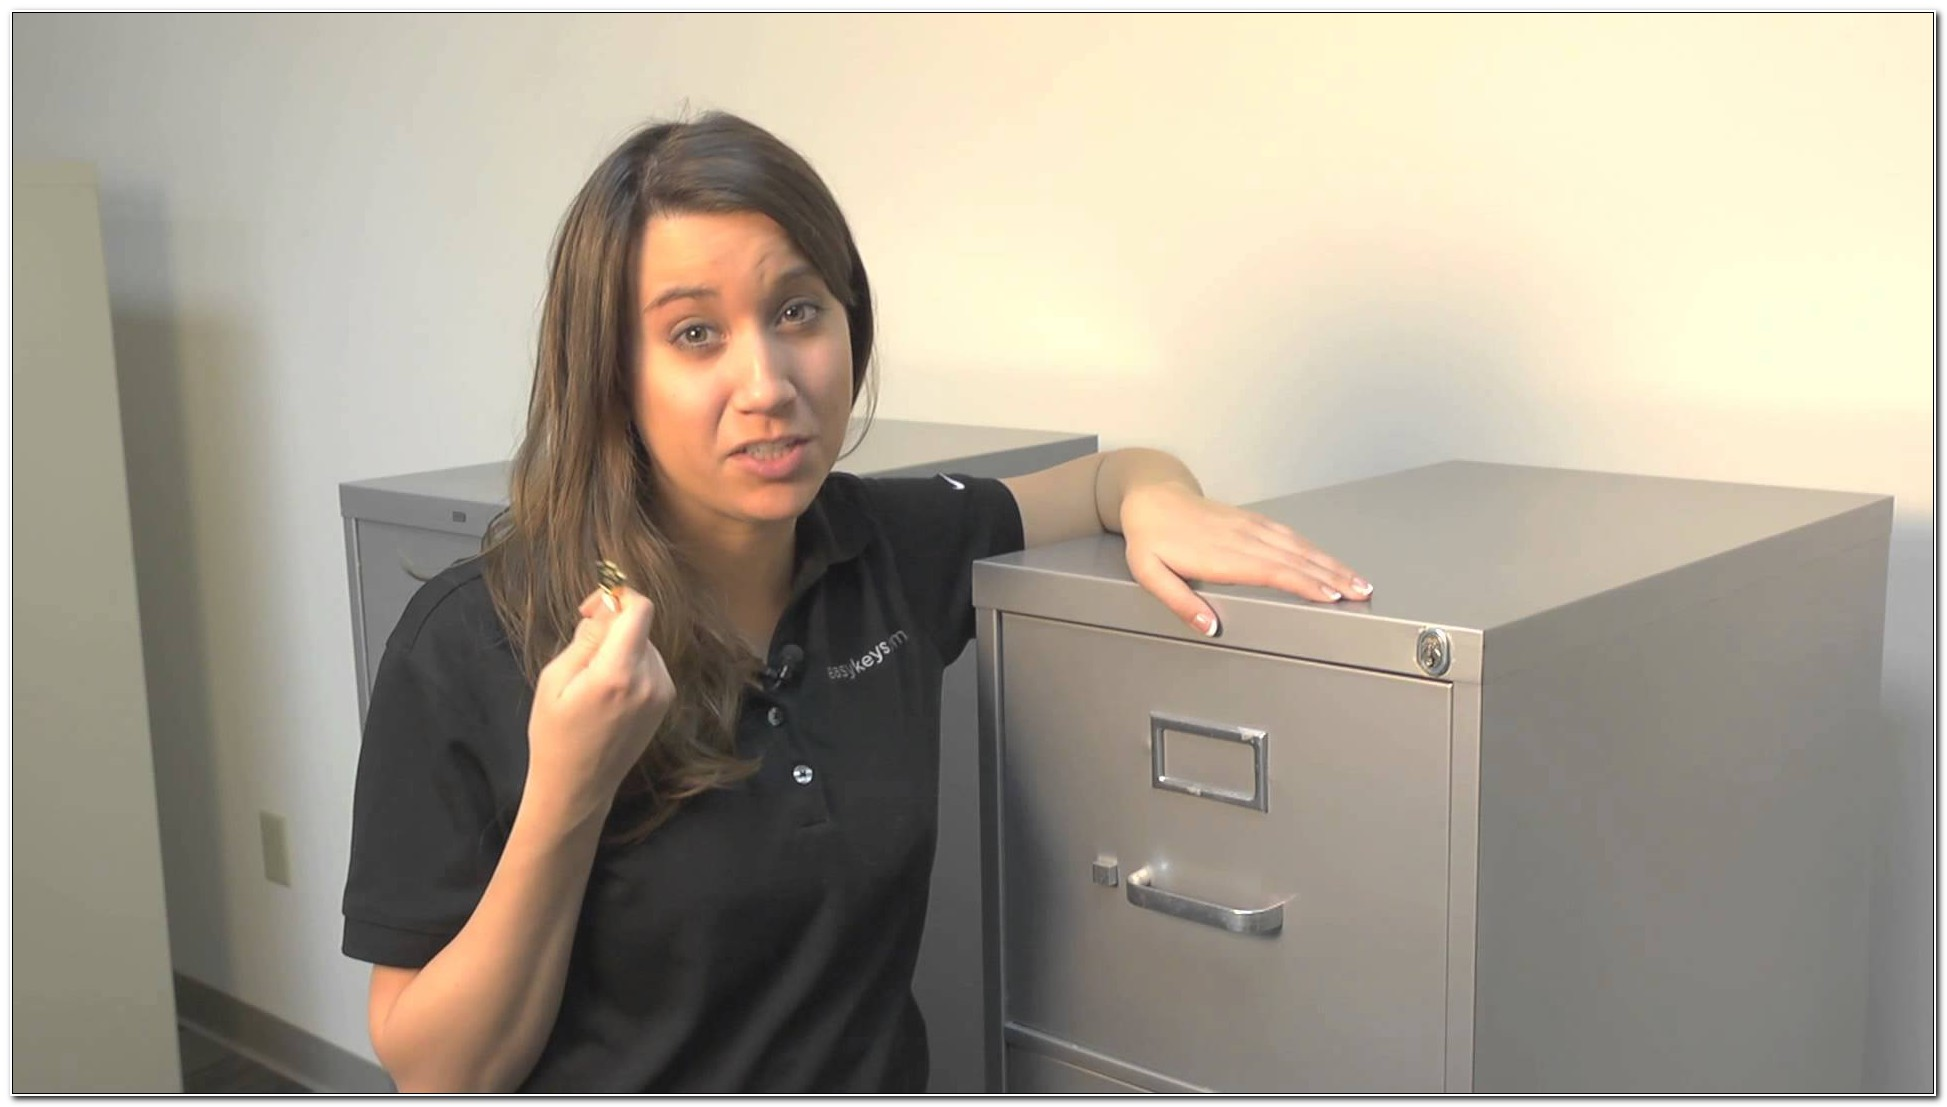 Anderson Hickey File Cabinet Lock